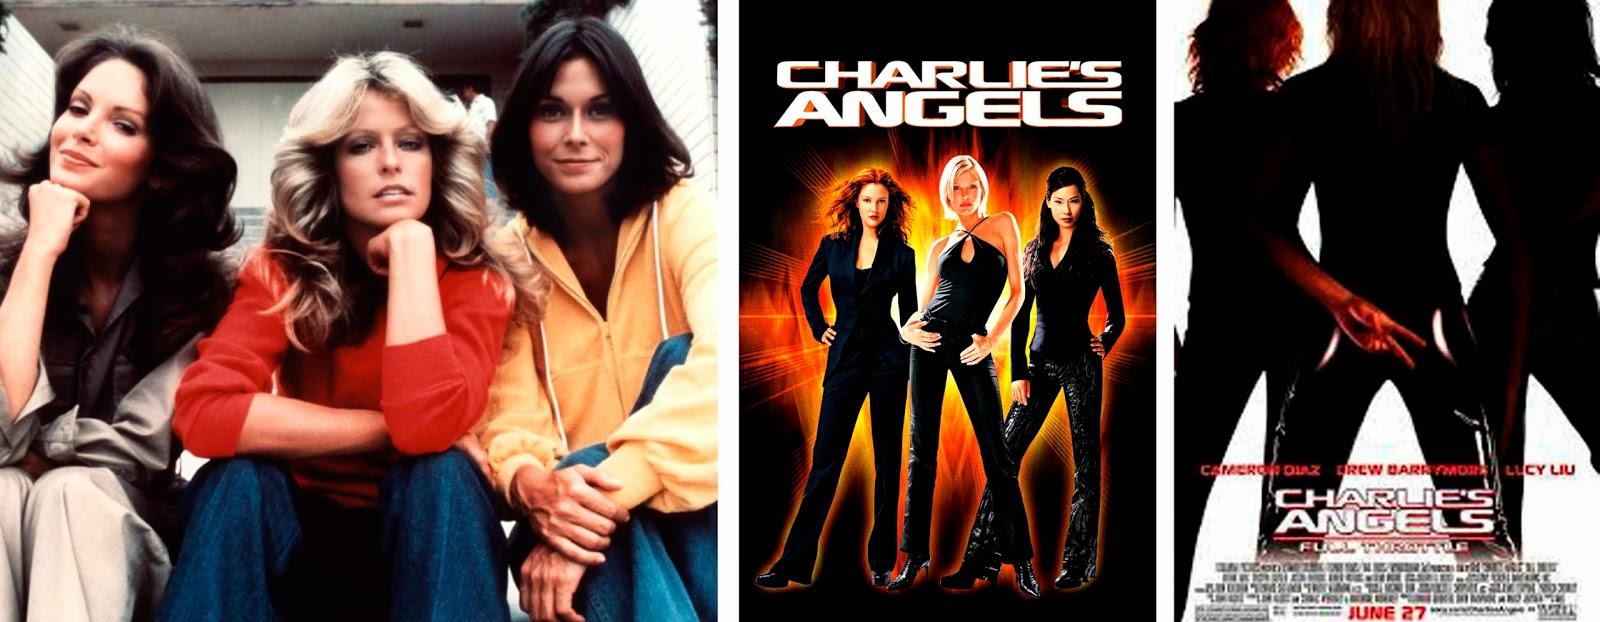 'Los ángeles de Charlie, al límite', Drew Barrymore, Cameron Díaz, Lucy Liu